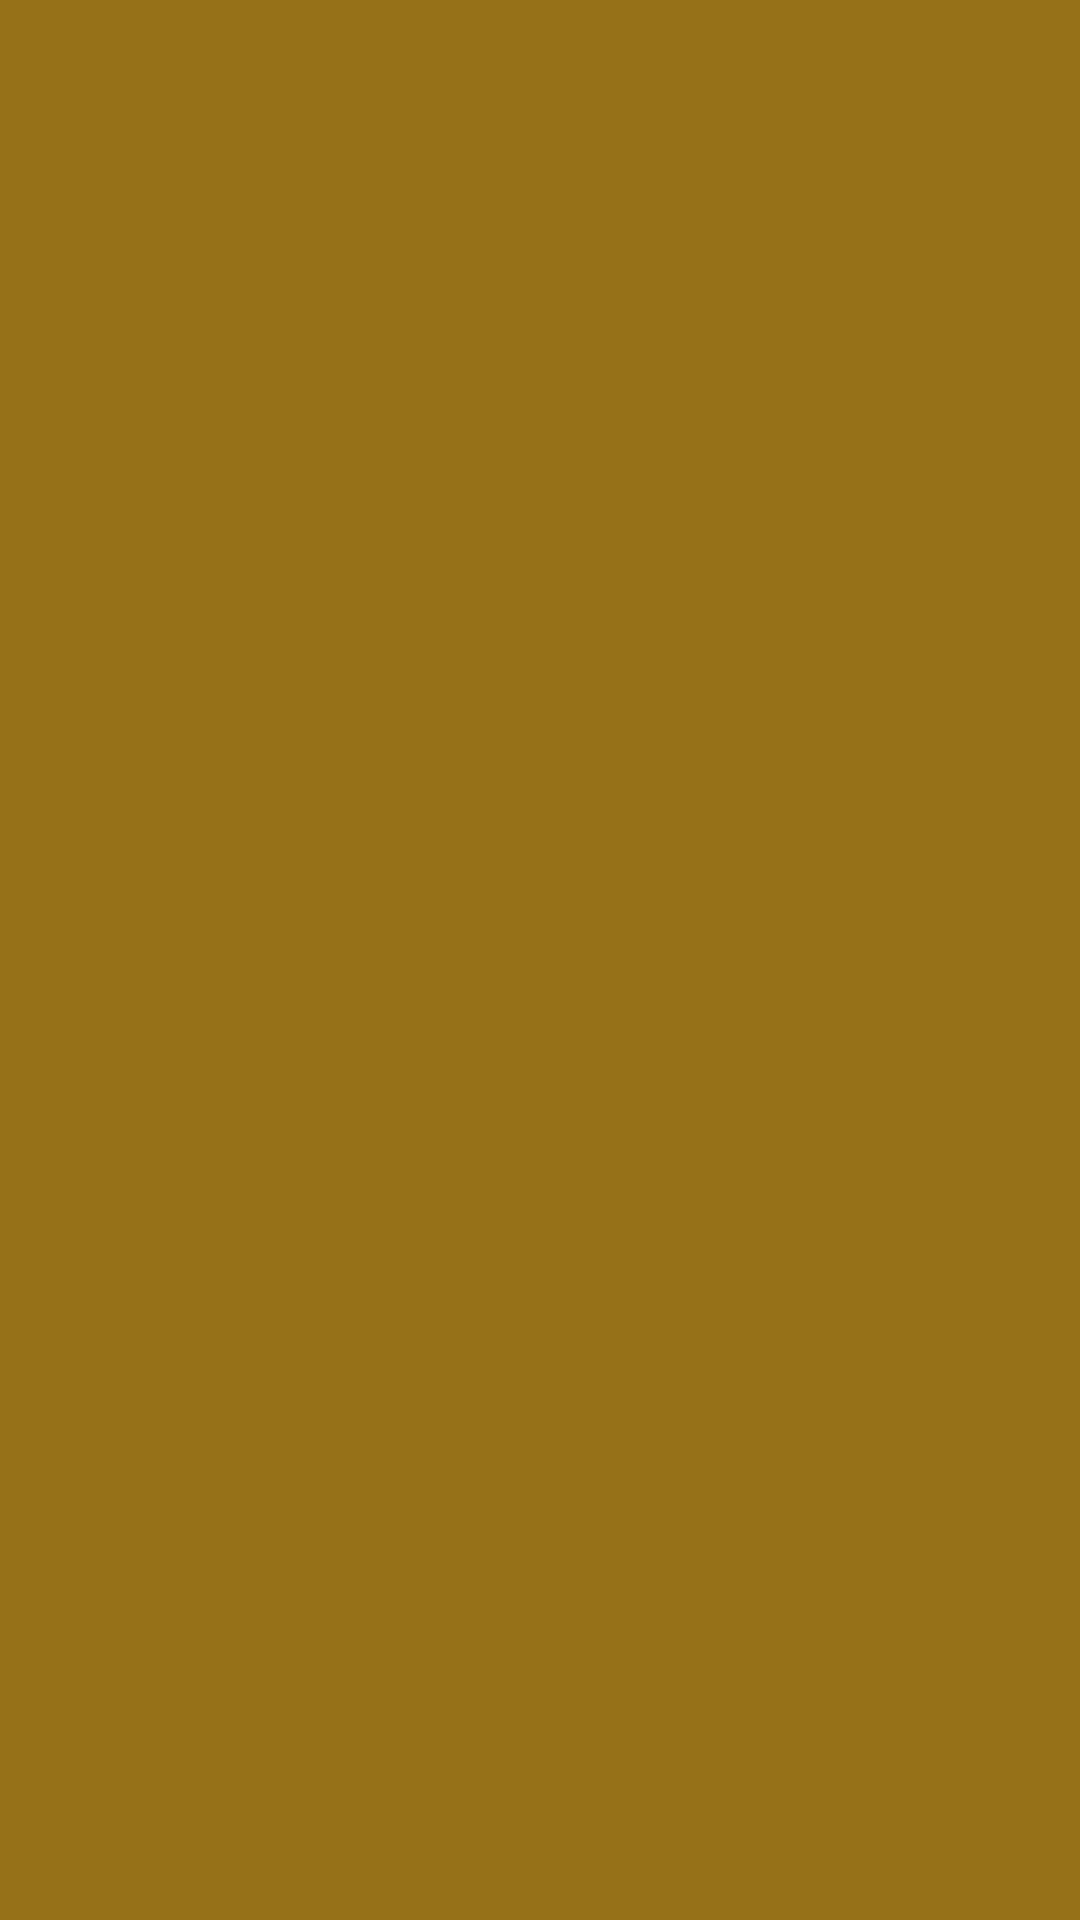 1080x1920 Mode Beige Solid Color Background